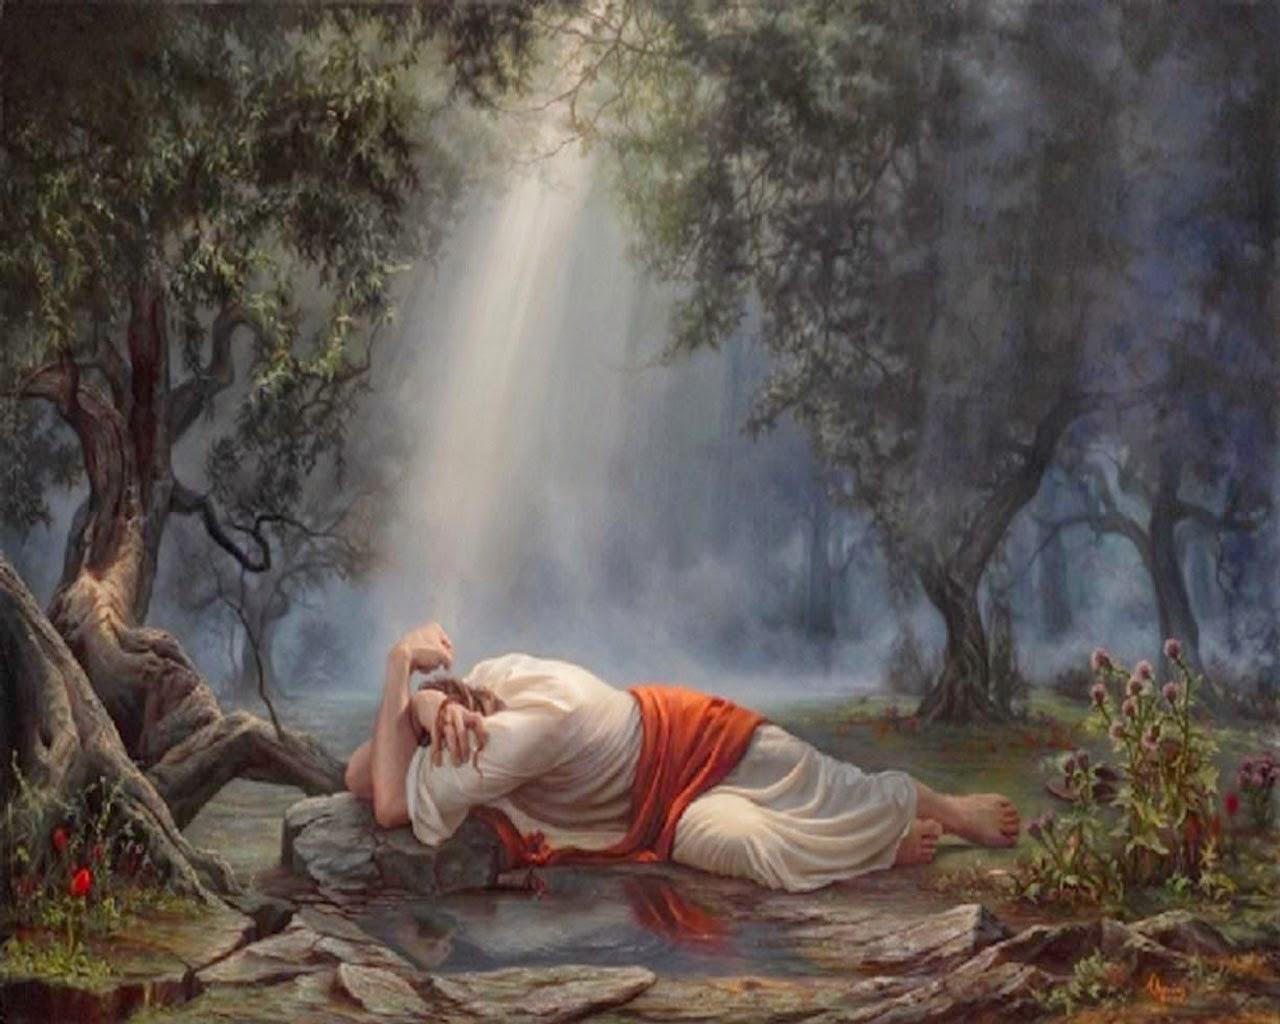 Word of truth lighthouse jesus 39 final week of work - Jesus in the garden of gethsemane ...